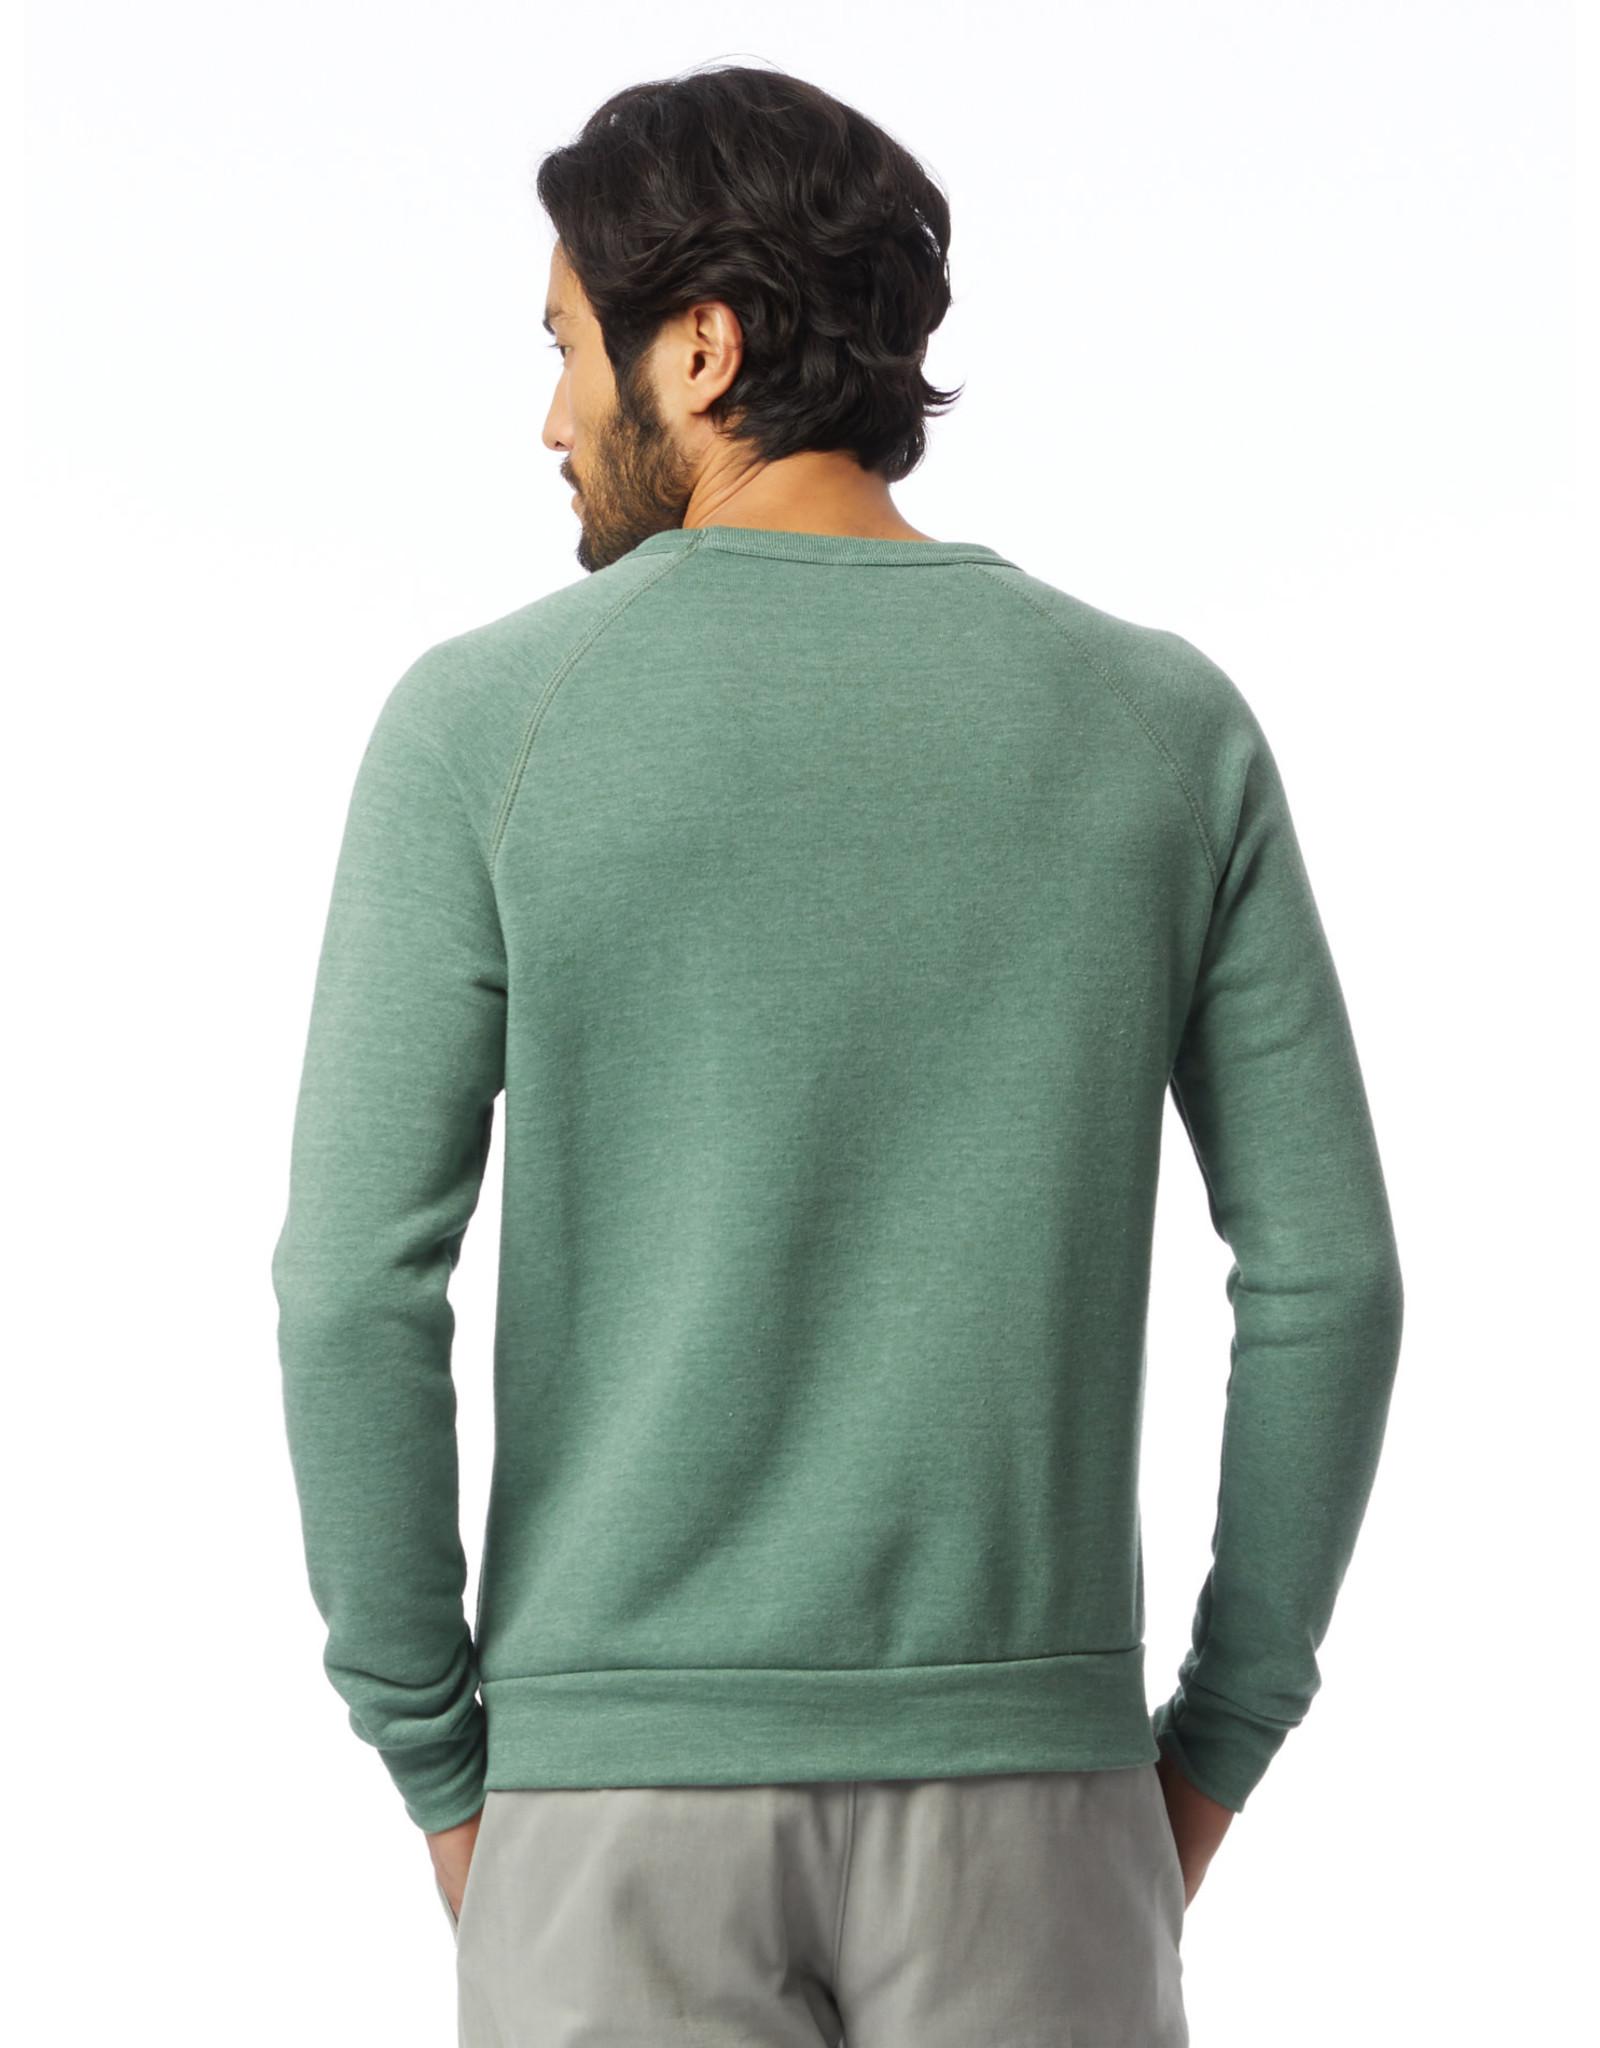 Alternative Apparel Eco-Fleece Champ Sweatshirt - Dusty Pine